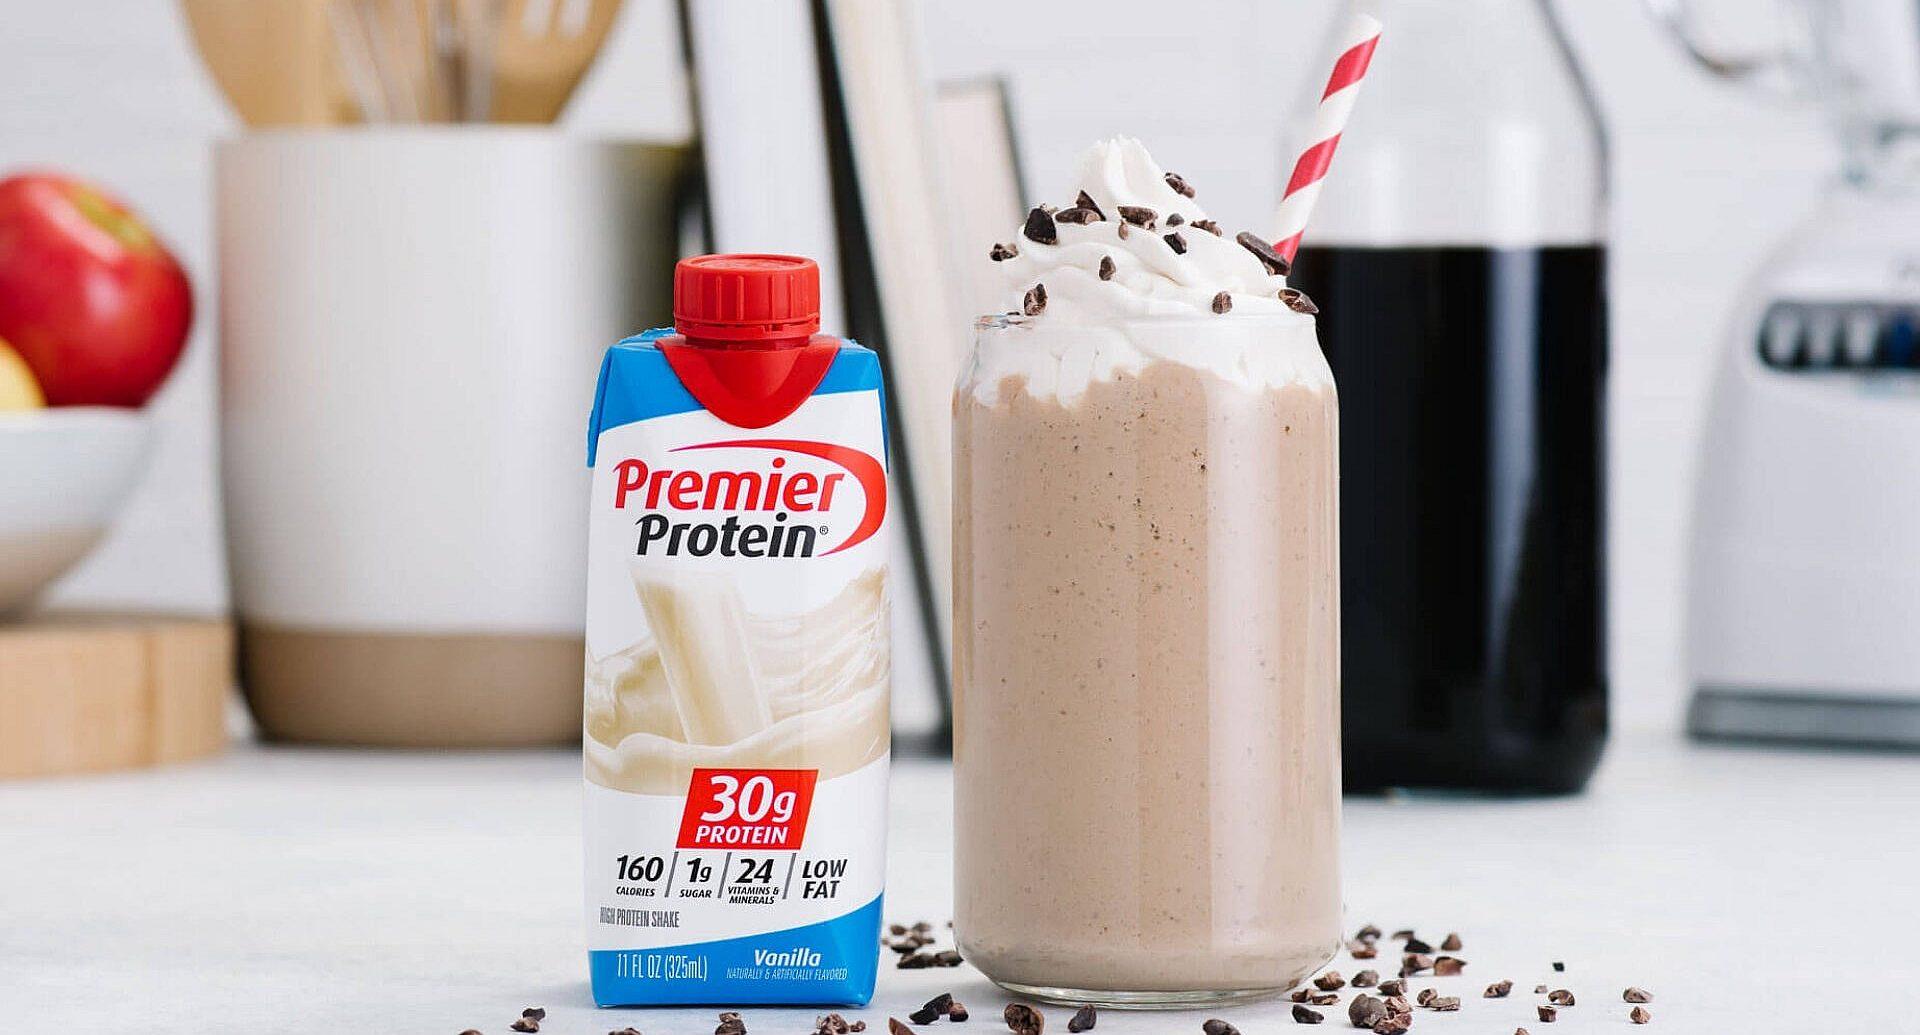 A milkshake made with Premier Protein Vanilla shake.